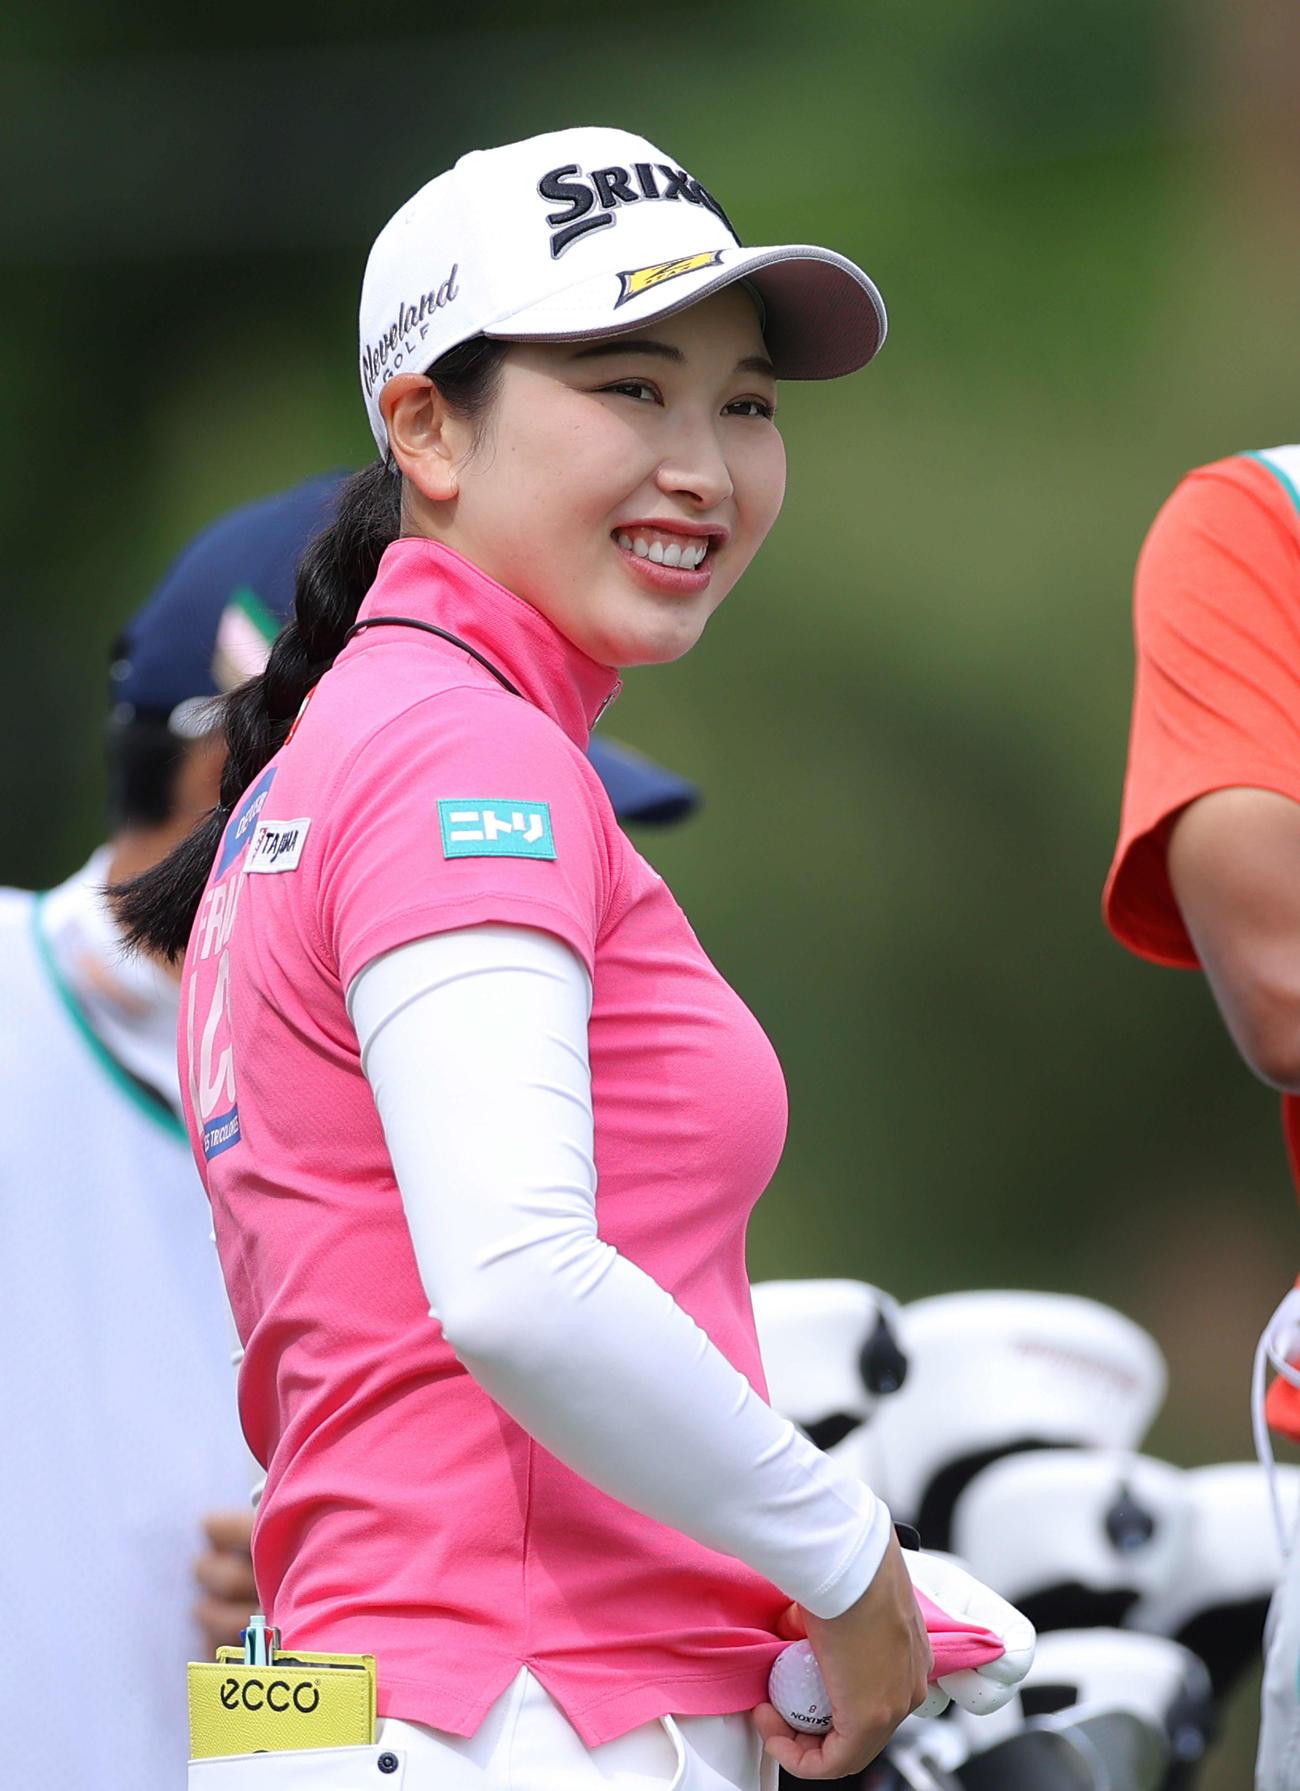 https://www.nikkansports.com/sports/golf/news/img/202105070000532-w1300_0.jpg